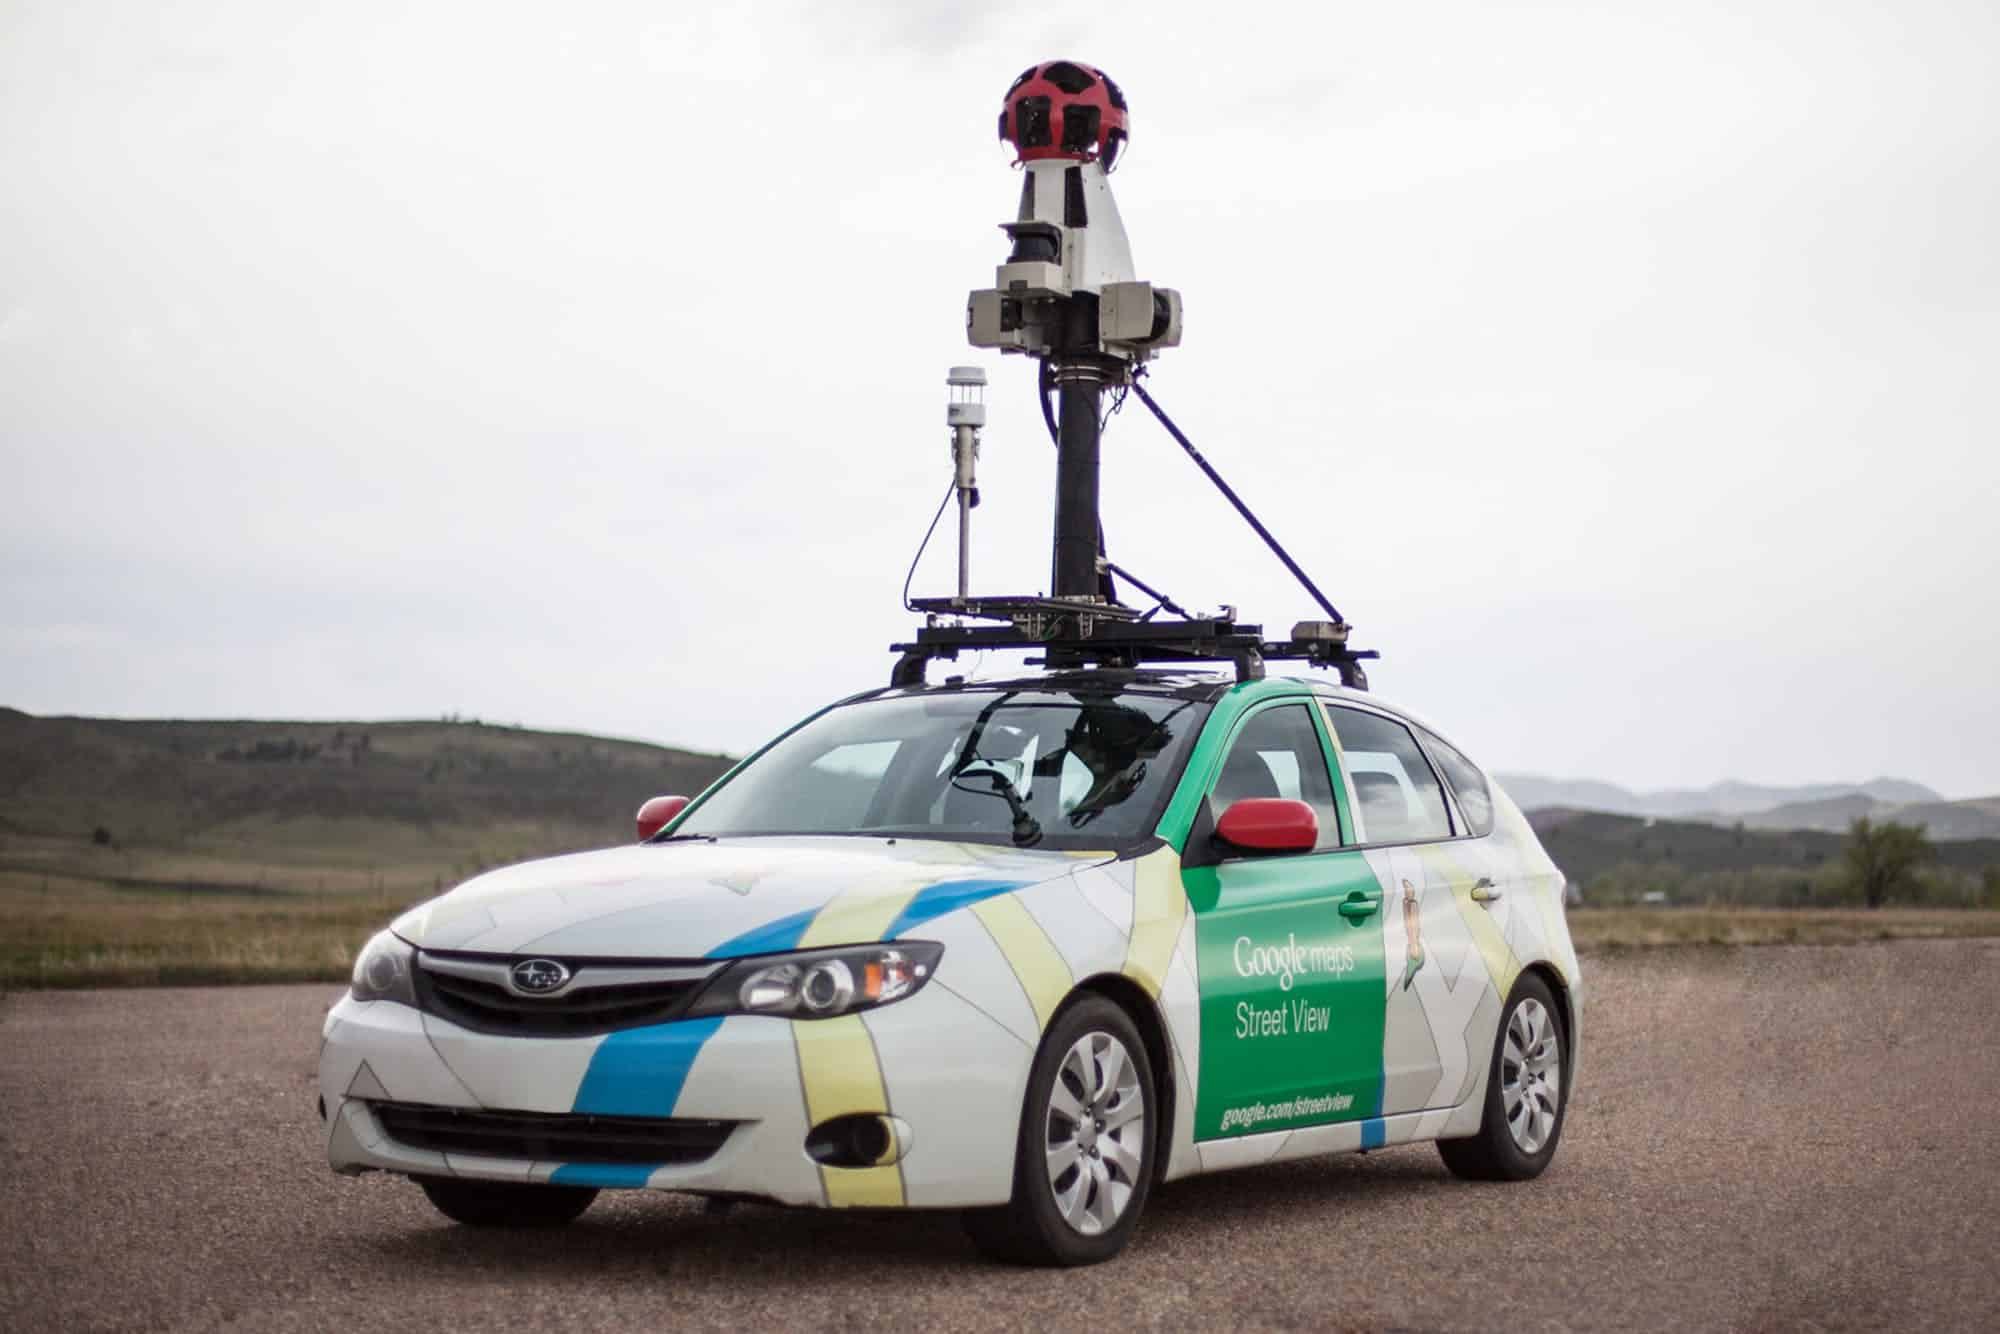 Google Street View-1